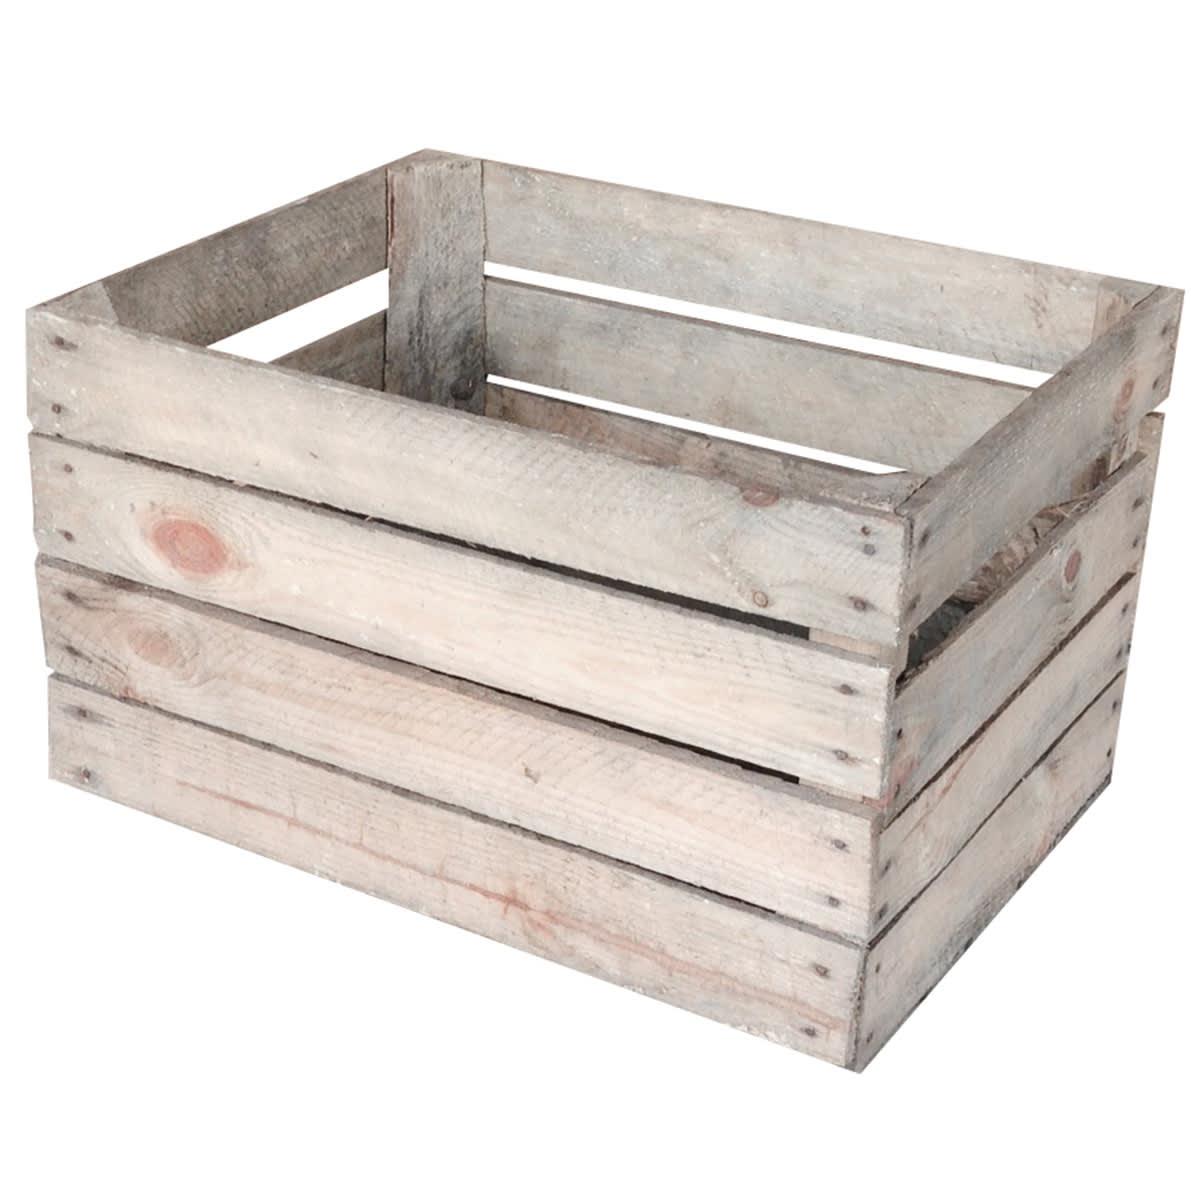 Opbevaringskasse med naturlig patina